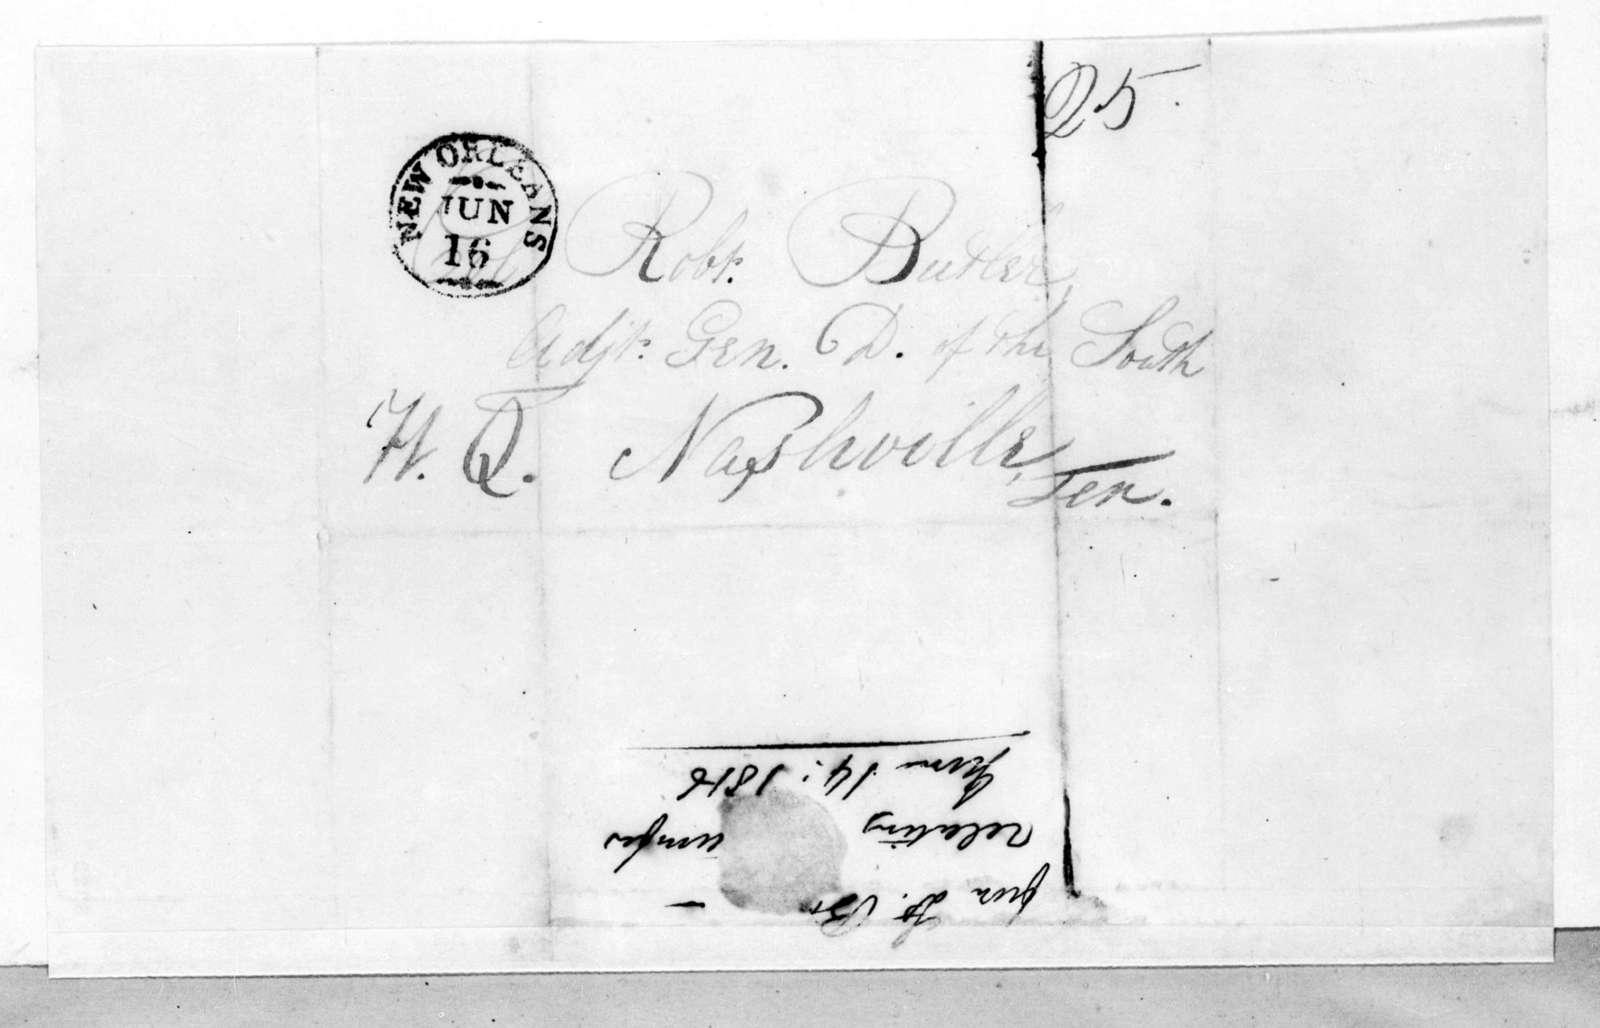 George William Boyd to Robert Butler, June 14, 1816